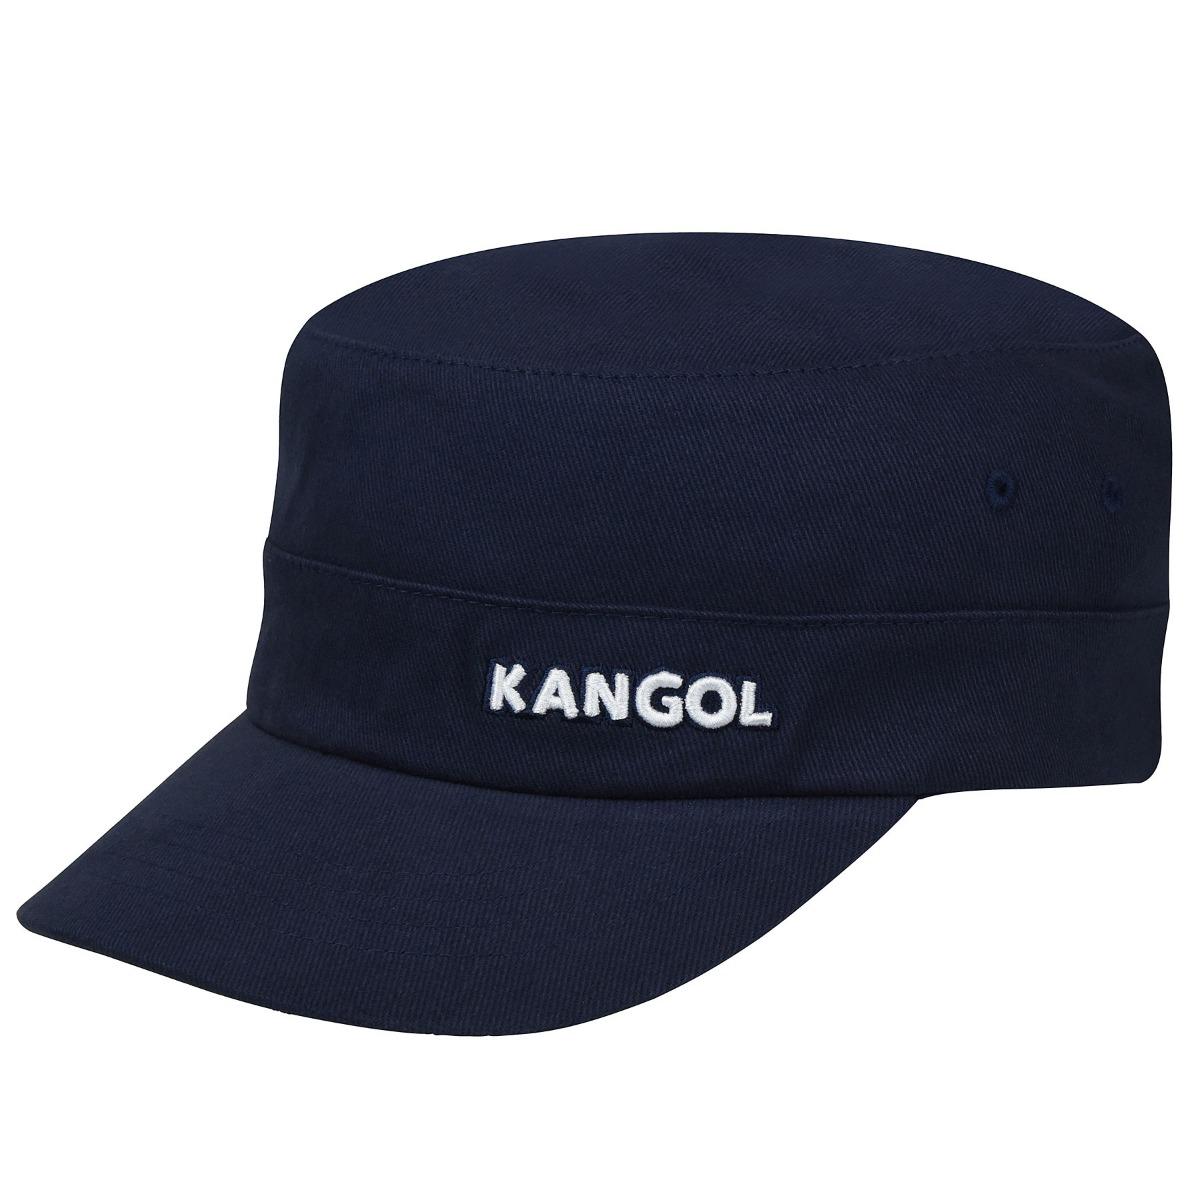 Kangol Men Women Cotton Twill Army Cap